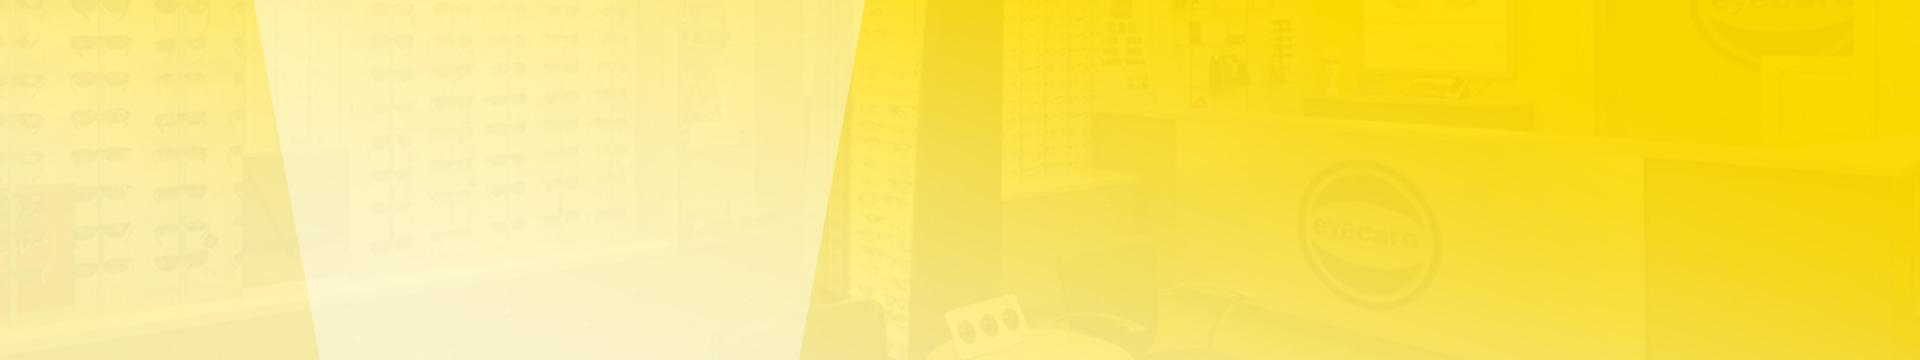 yellow cta bg